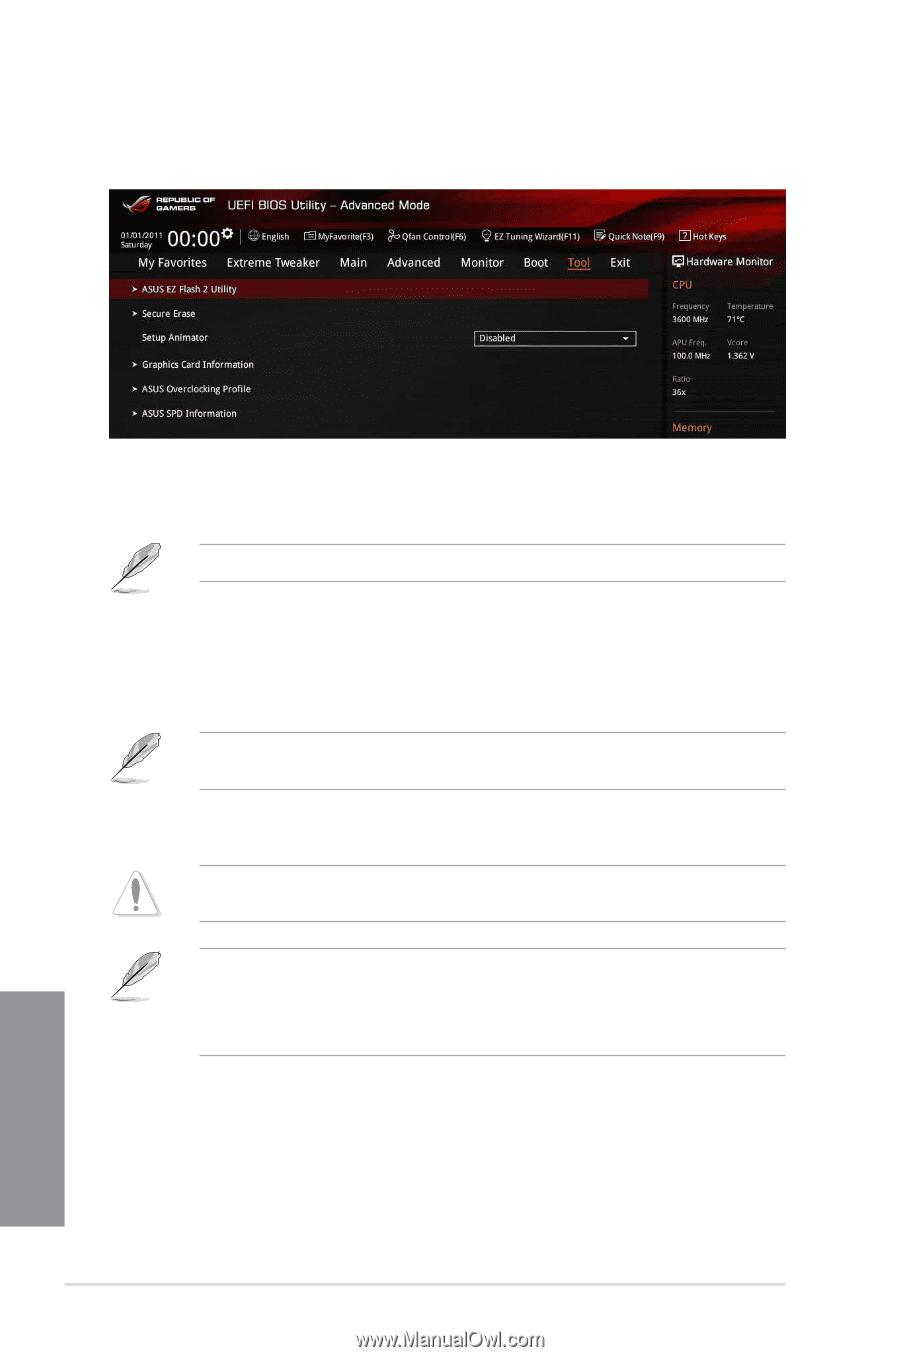 Asus CROSSBLADE RANGER   User Guide - Page 117